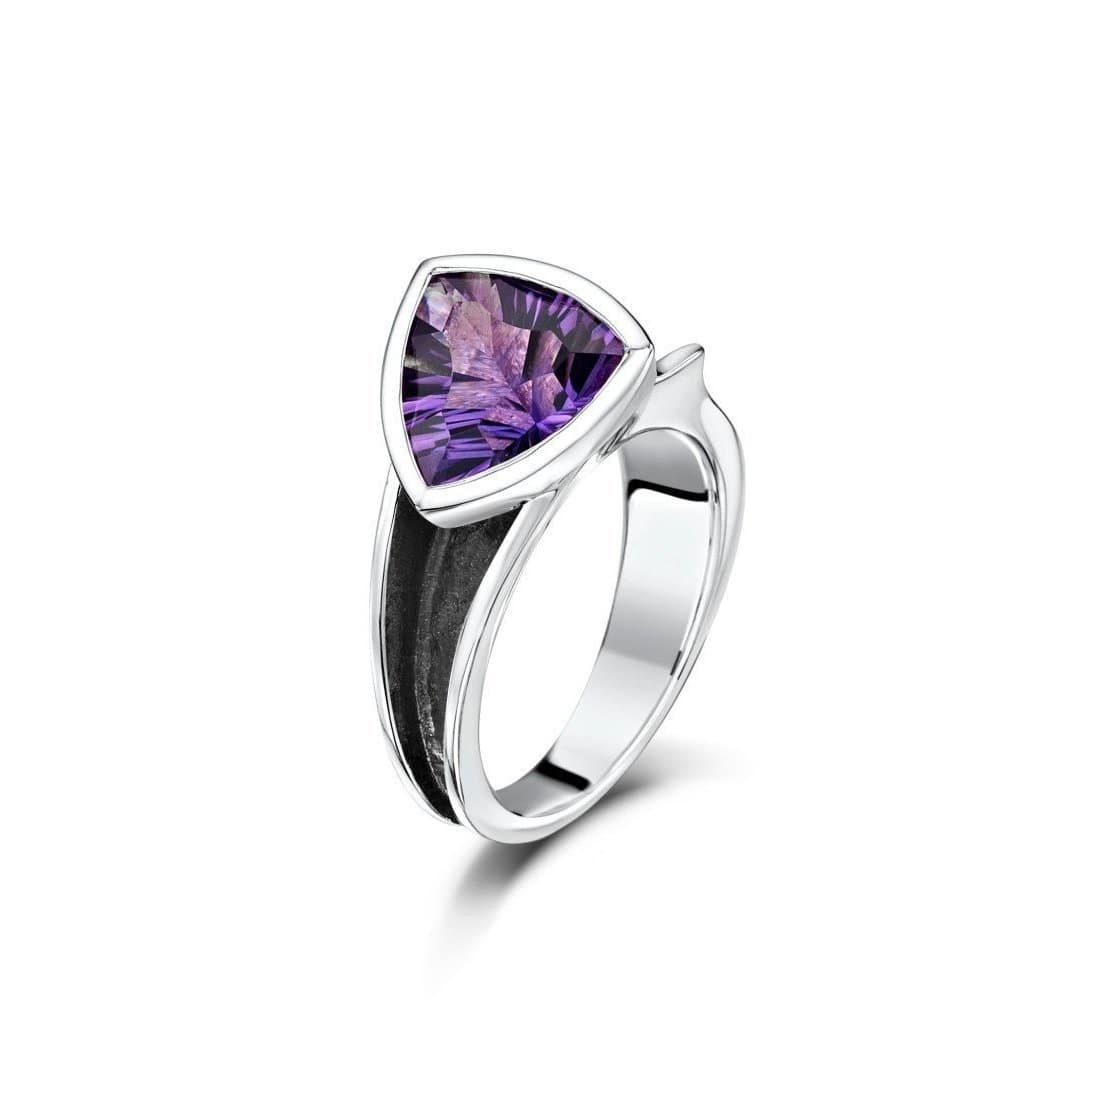 Oxidised Sterling Silver & Amethyst Ring